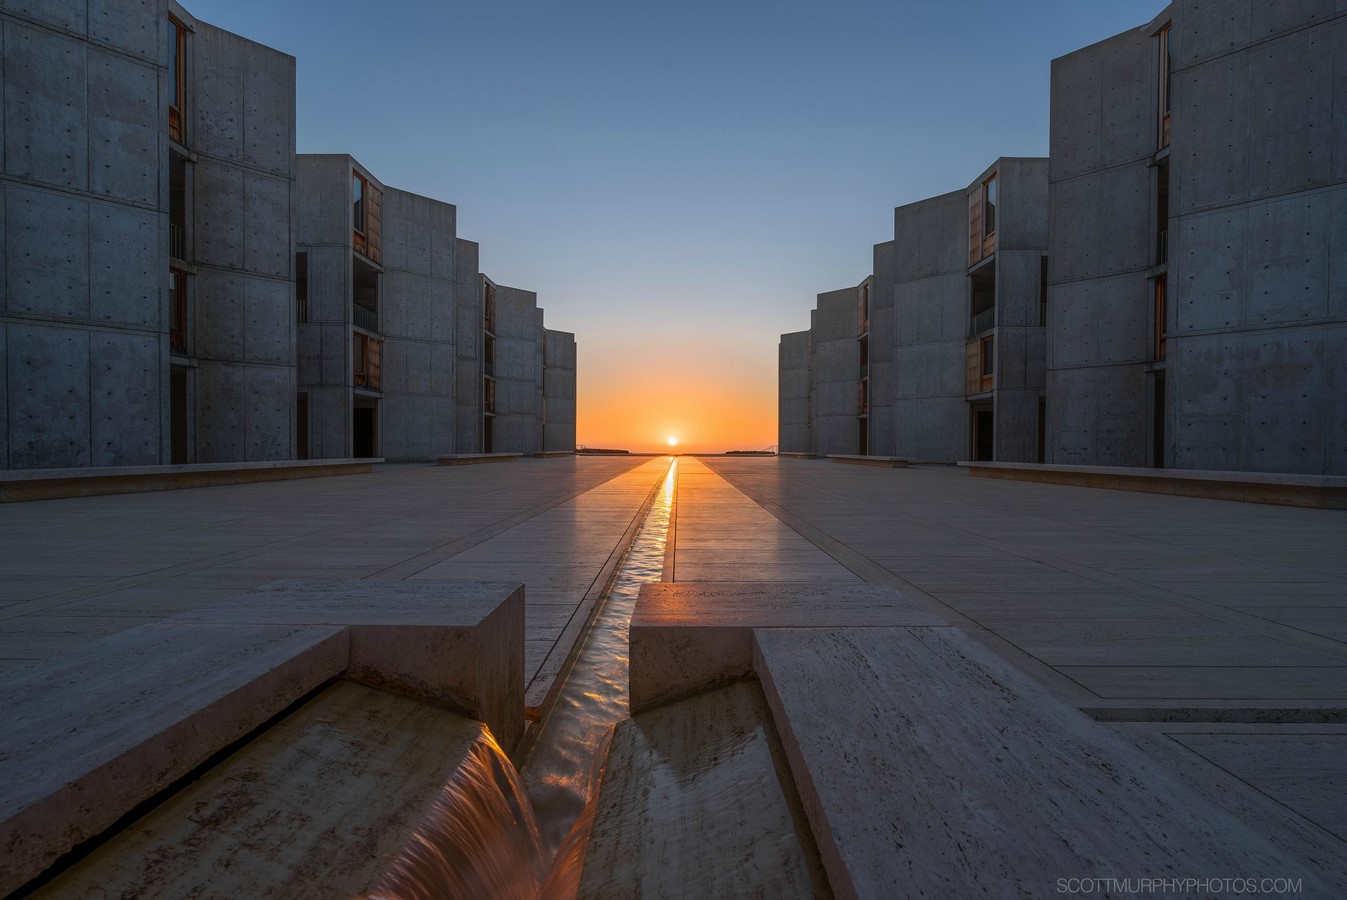 Salk Institute by Louis Kahn The pozzolanic concrete structure - Sheet1